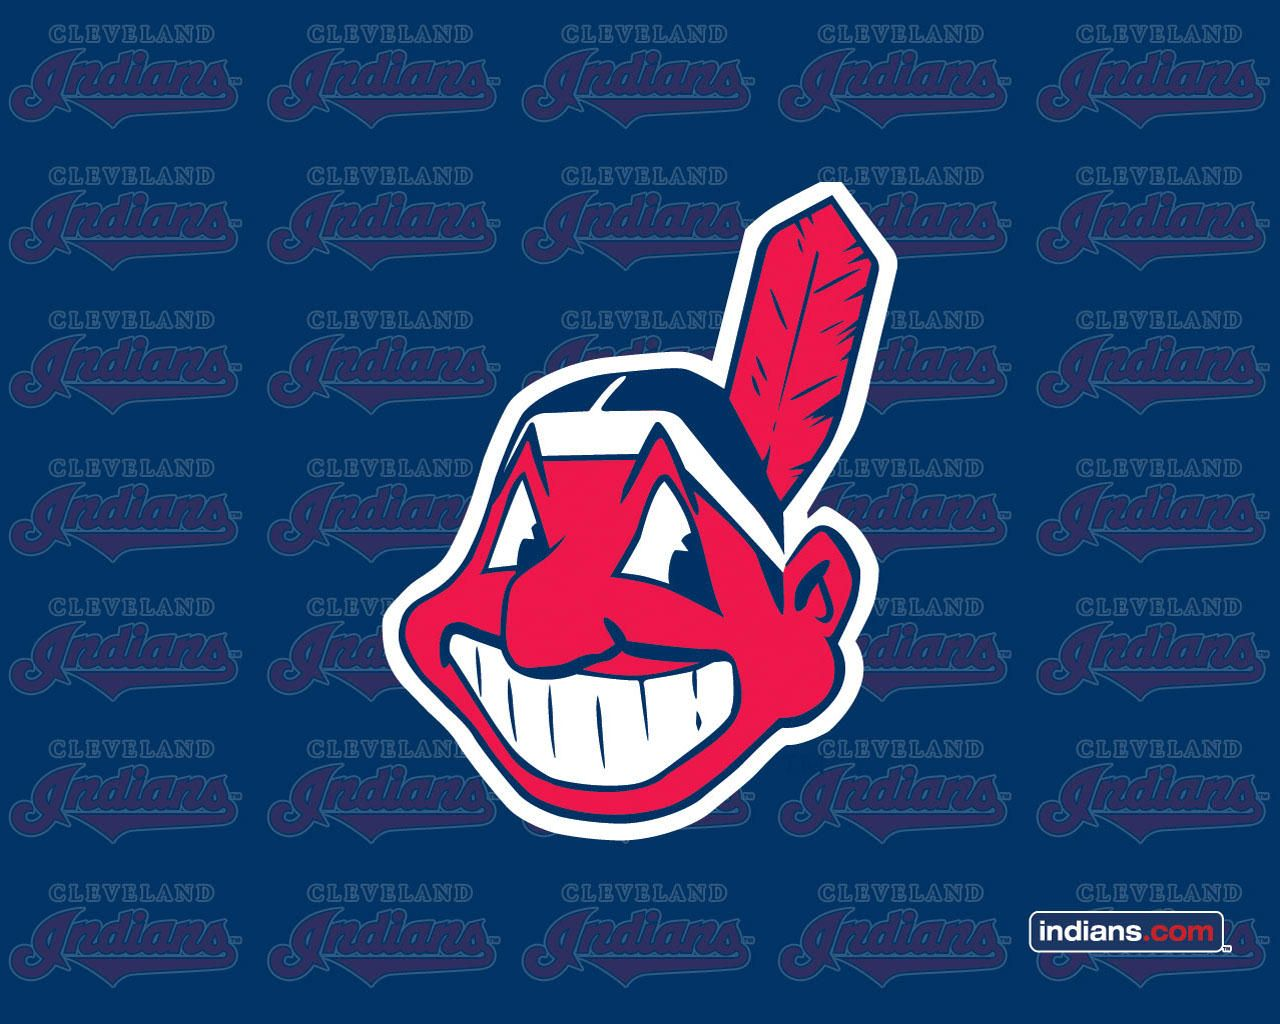 Cleveland Indians Atlanta Braves Iphone Wallpaper Cleveland Indians Game Cleveland Indians